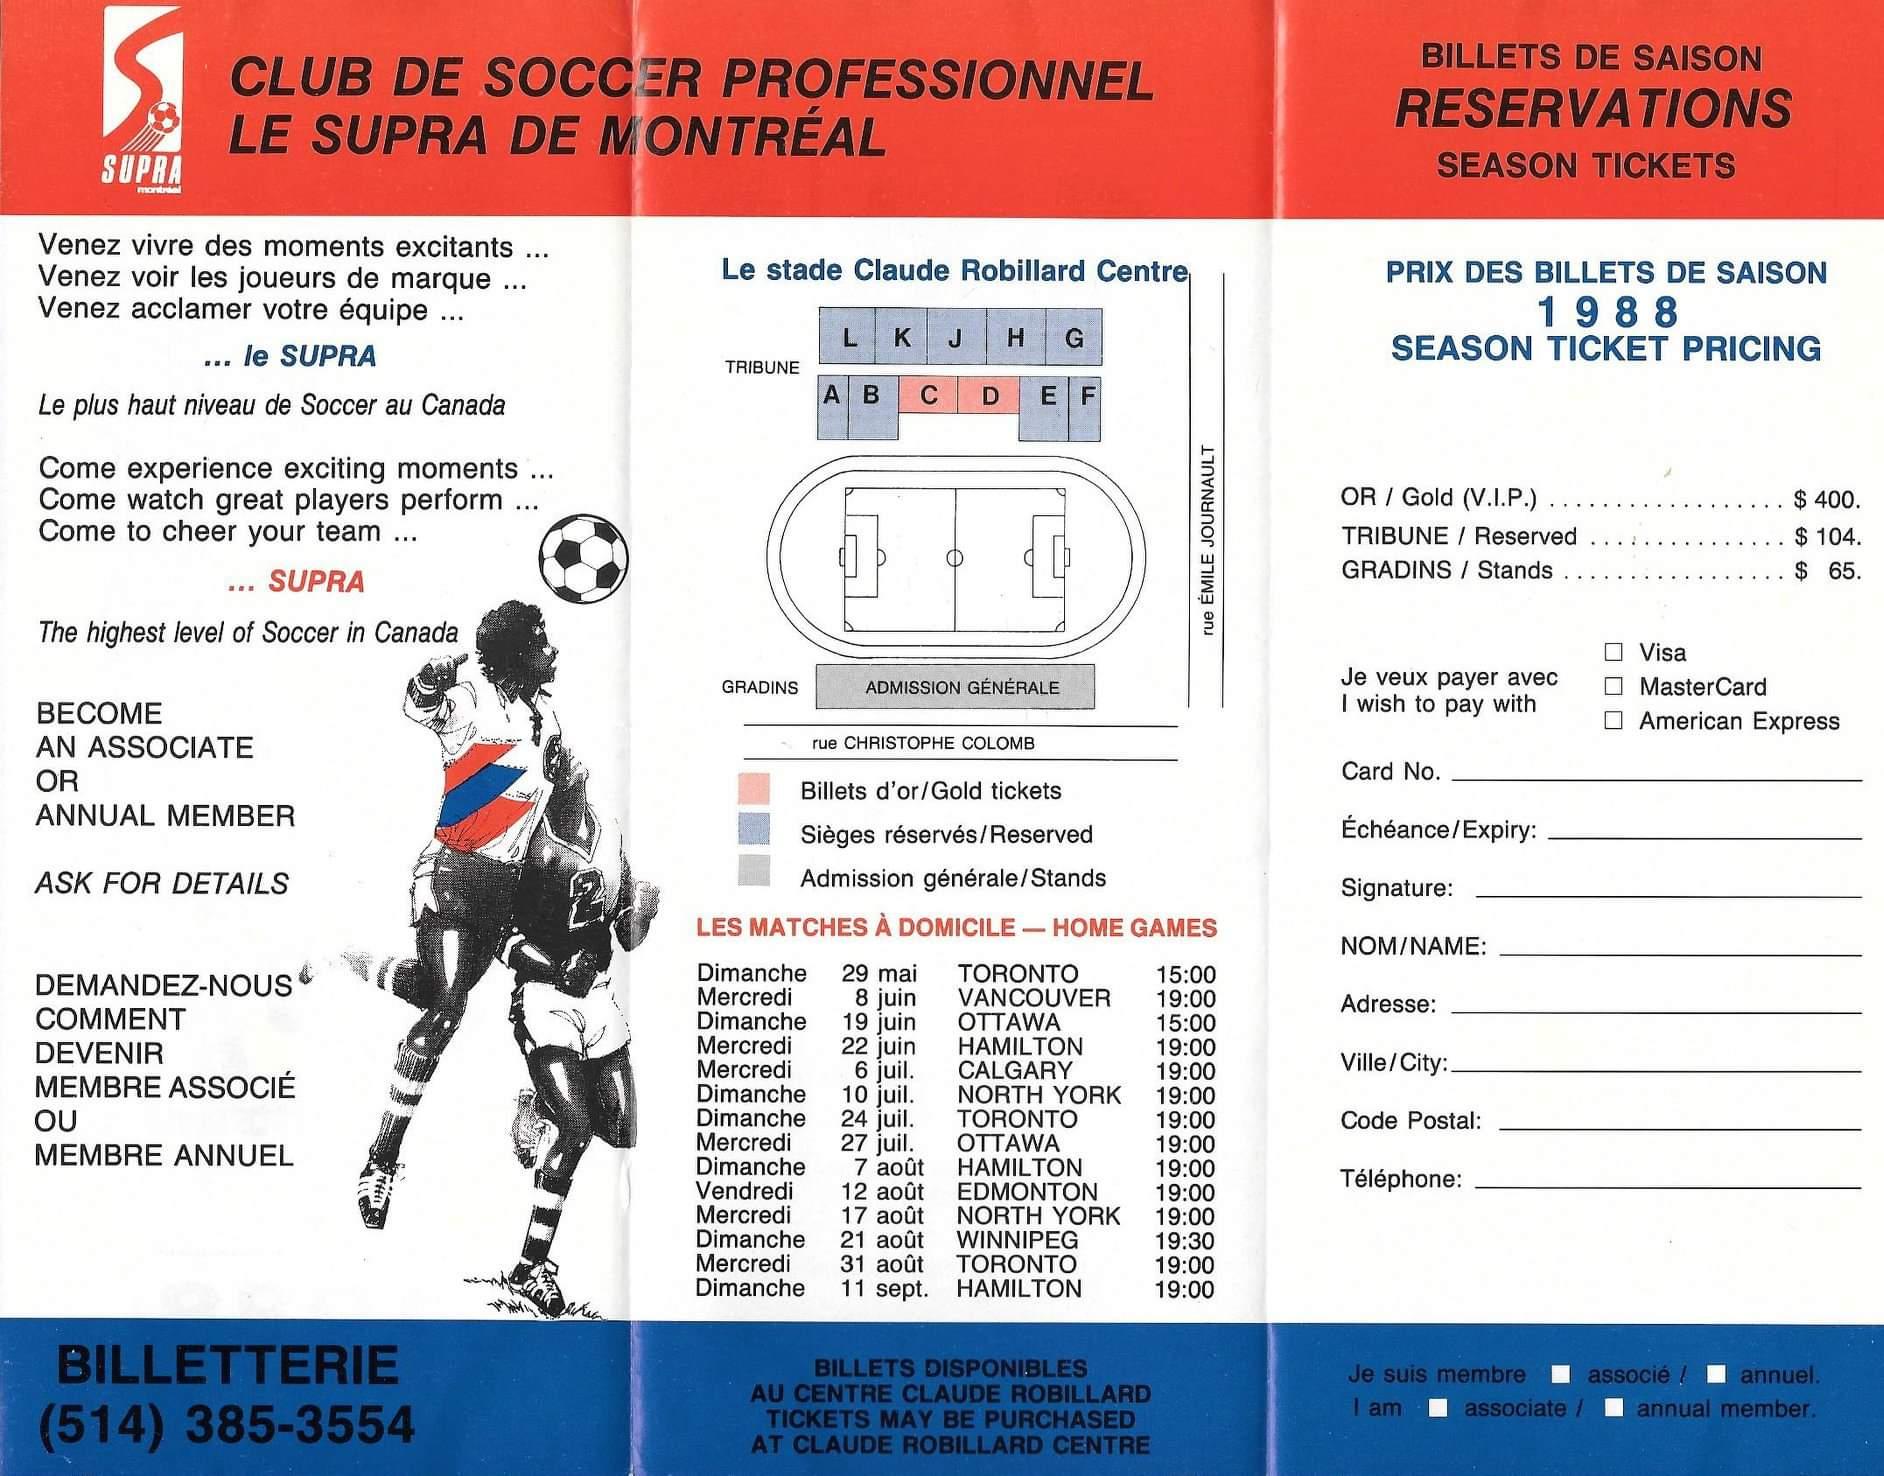 Seasons Tickets Booklet (C/O Rich Paschette)